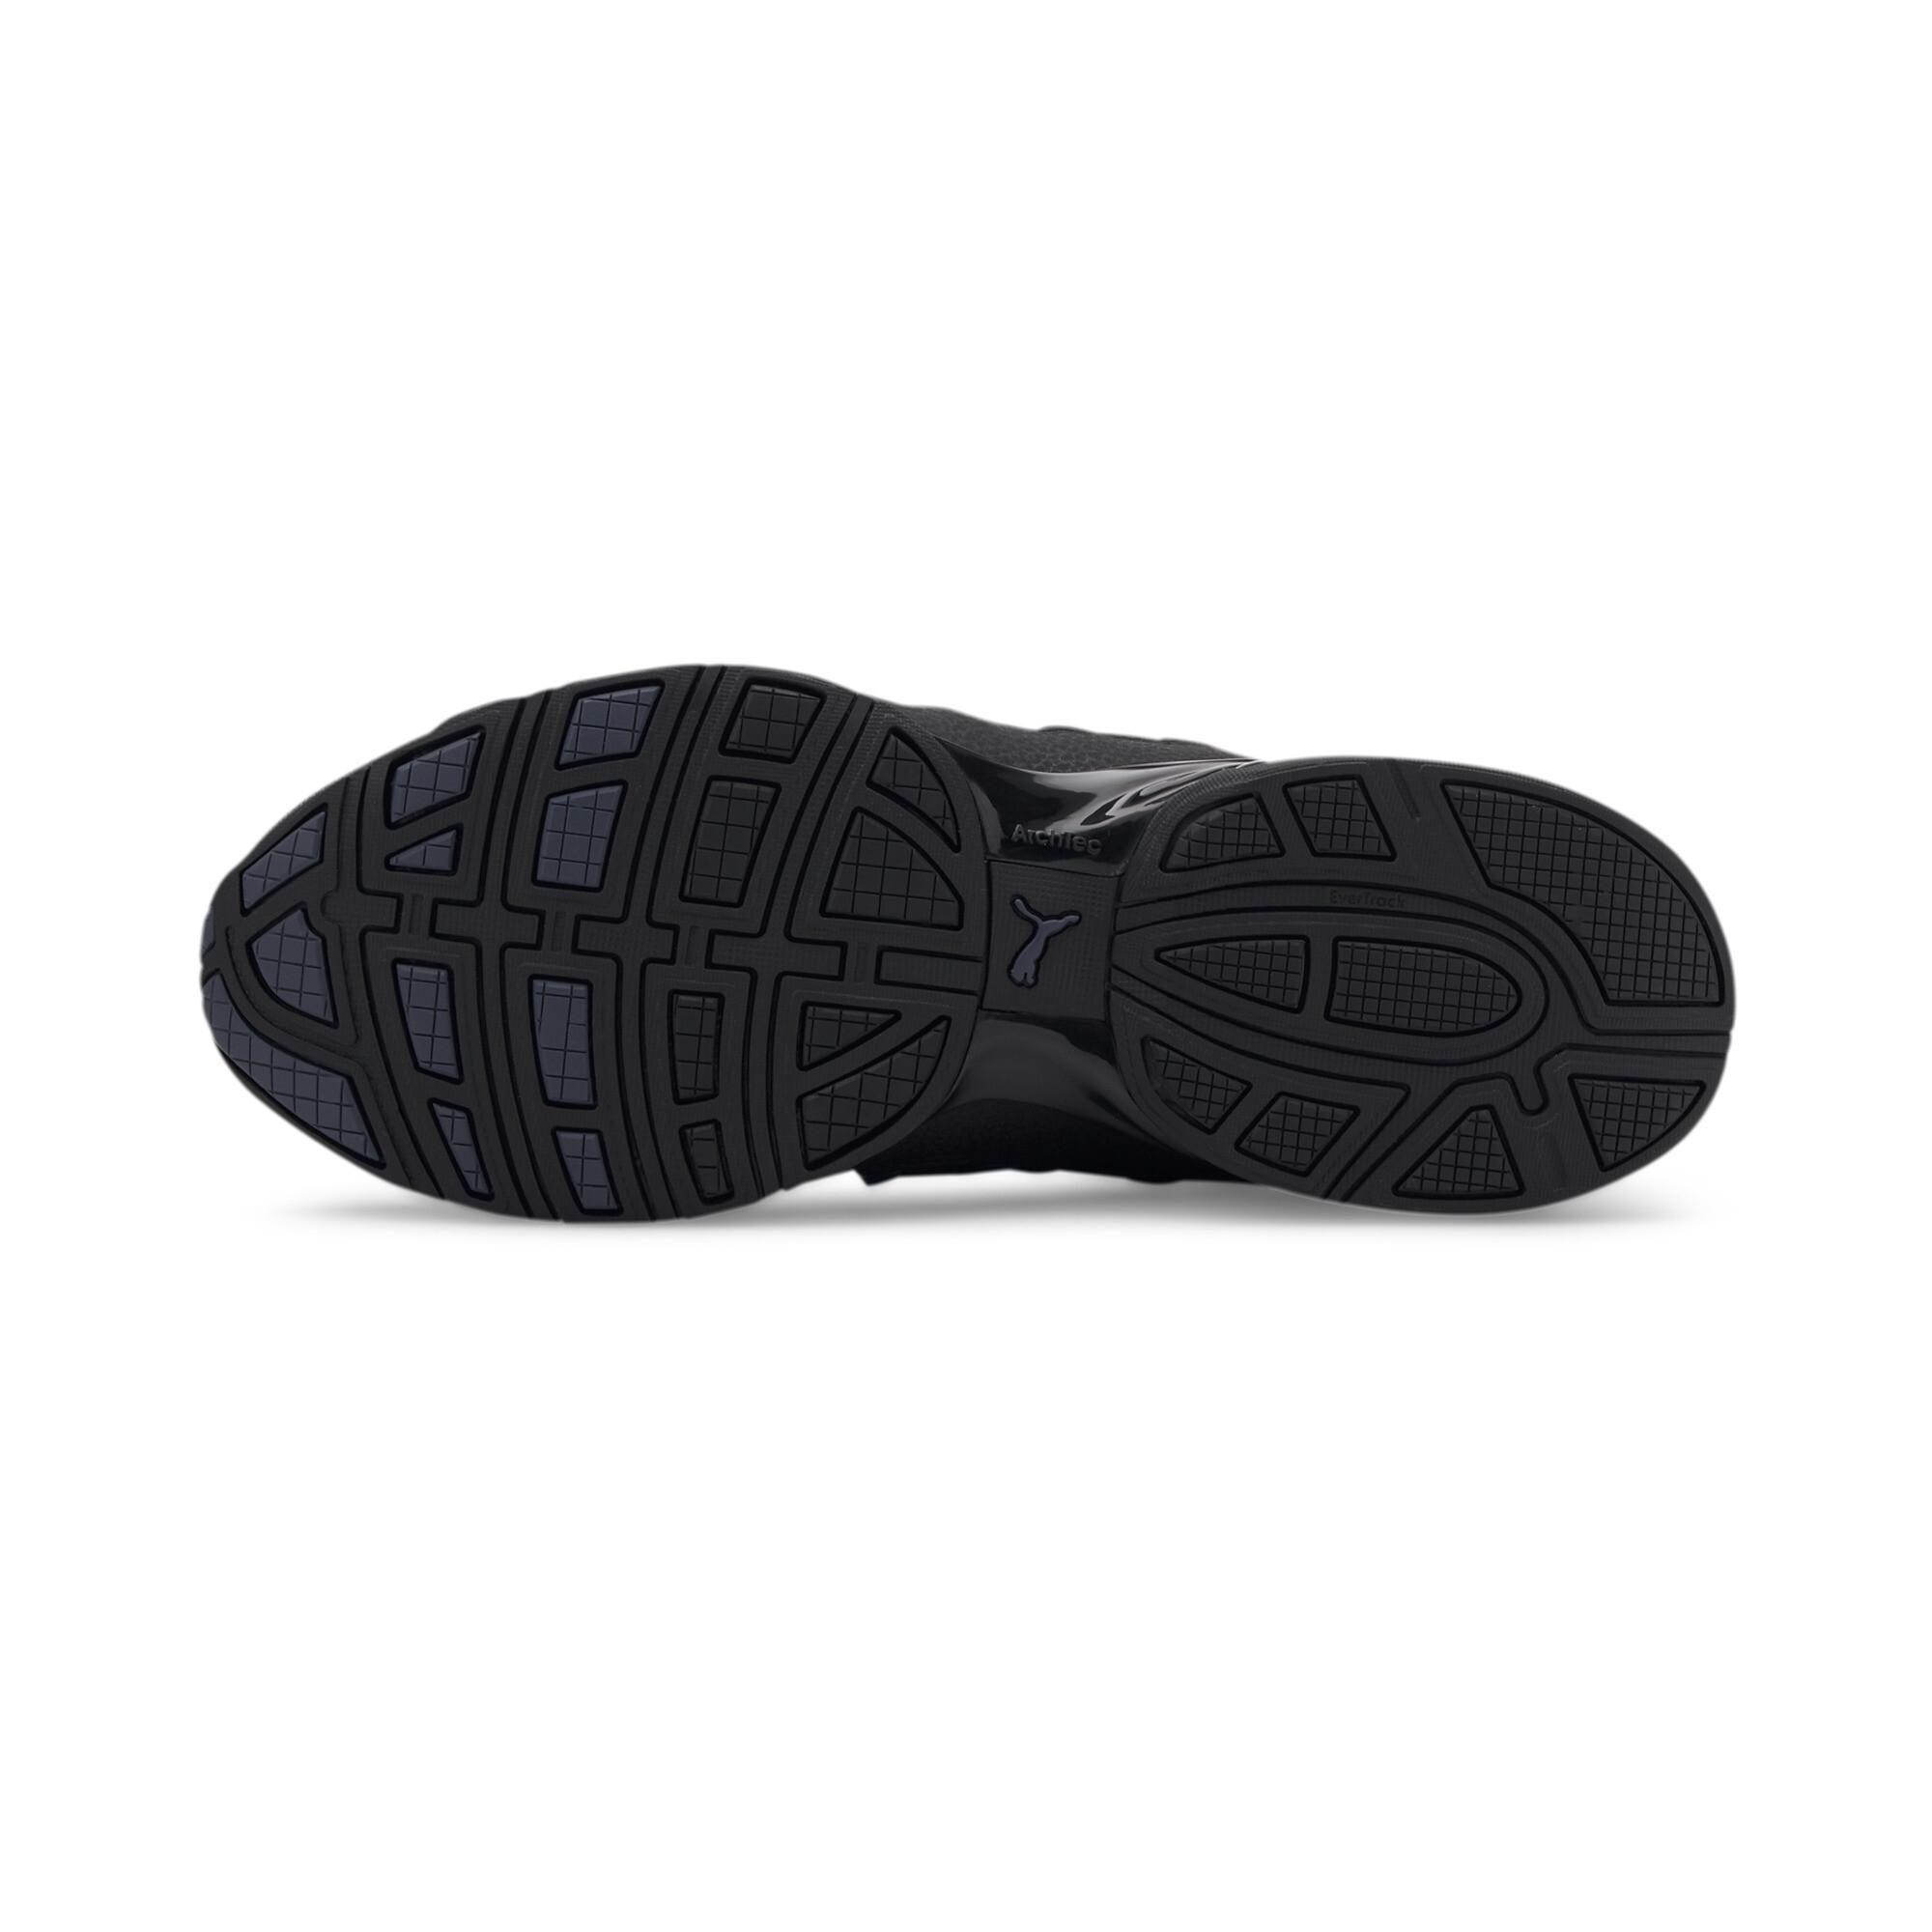 PUMA-Men-039-s-CELL-Regulate-Bold-Training-Shoes thumbnail 6